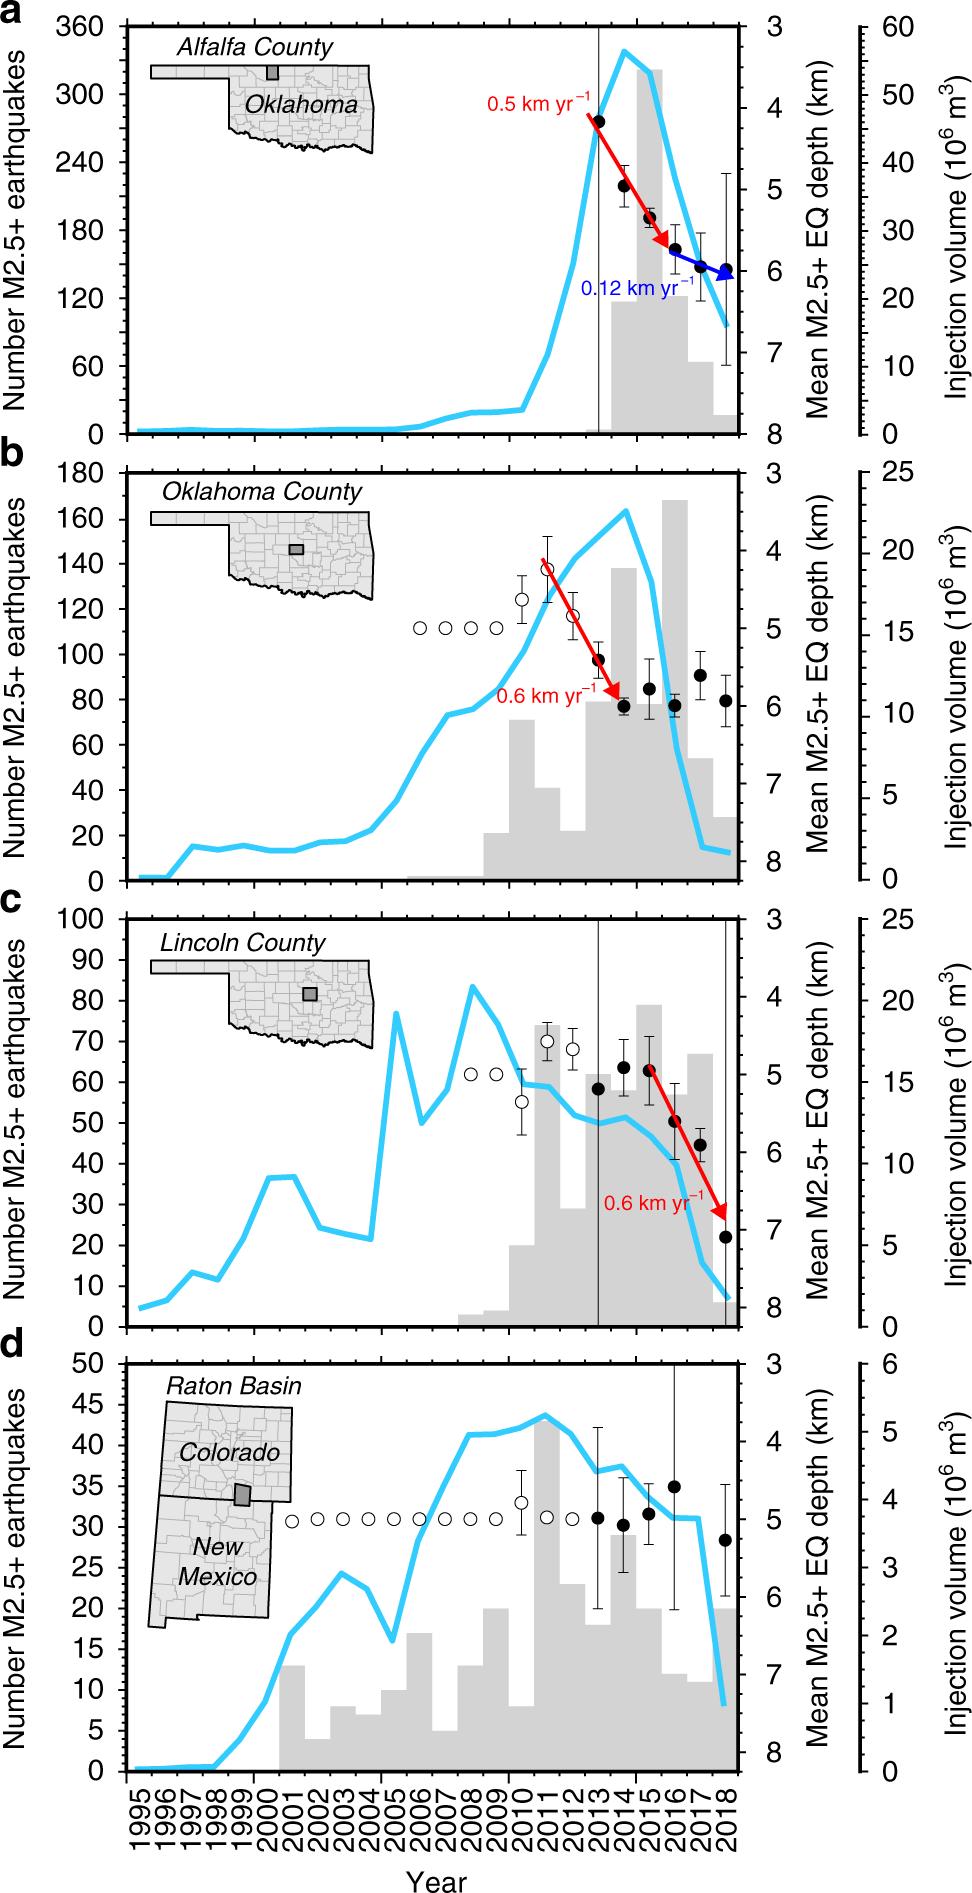 High density oilfield wastewater disposal causes deeper